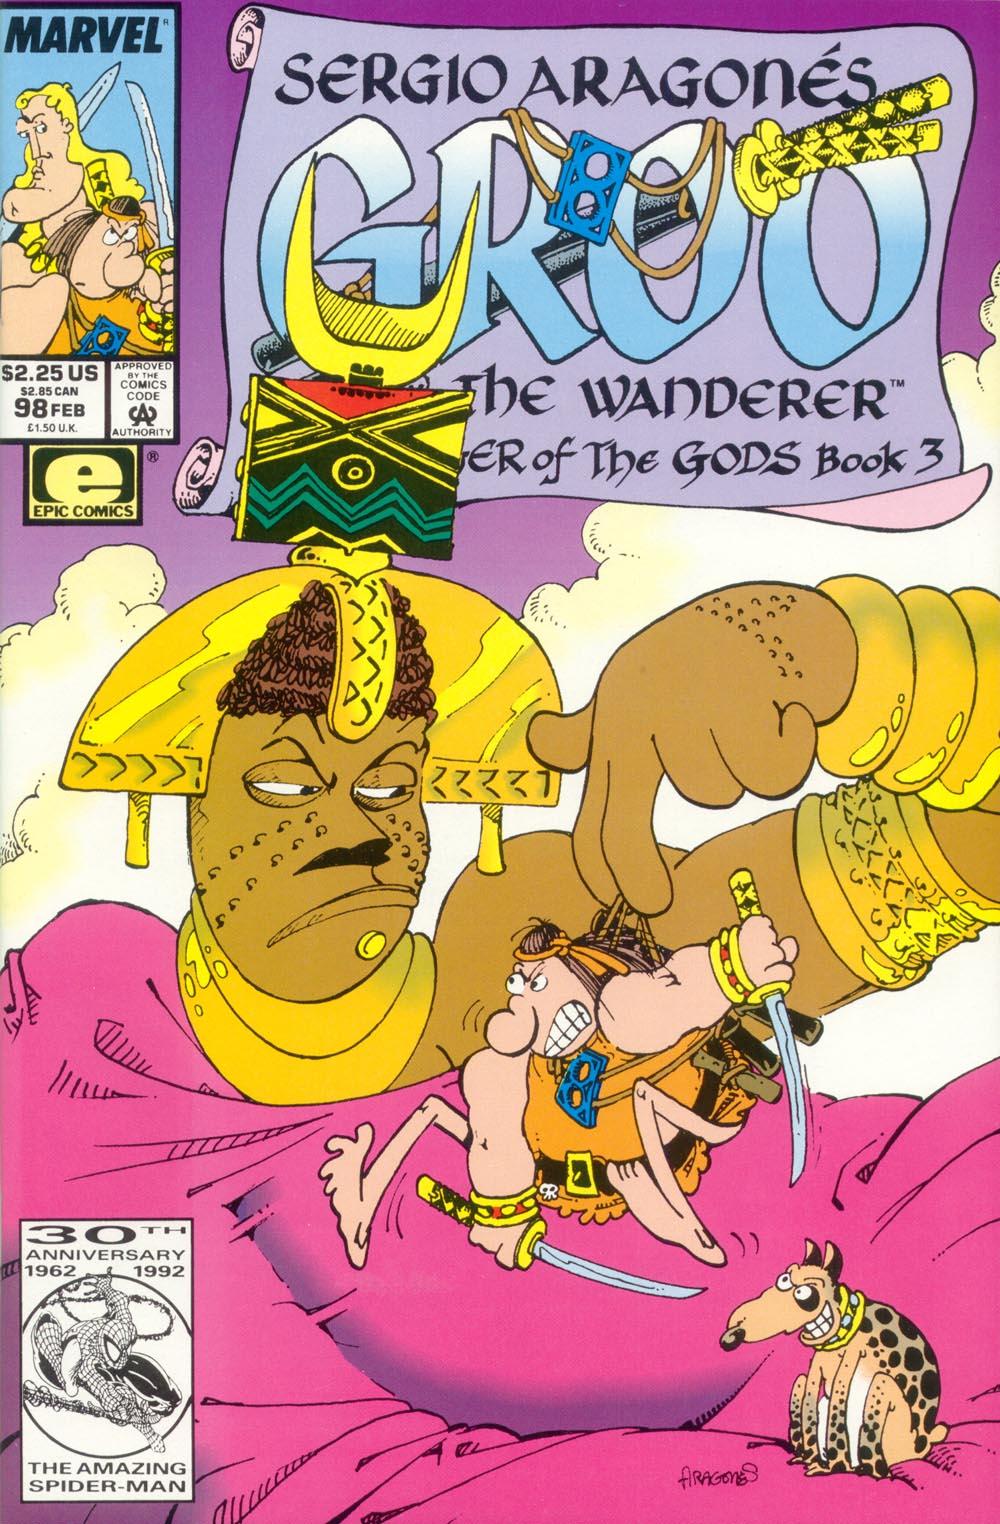 Read online Sergio Aragonés Groo the Wanderer comic -  Issue #98 - 1